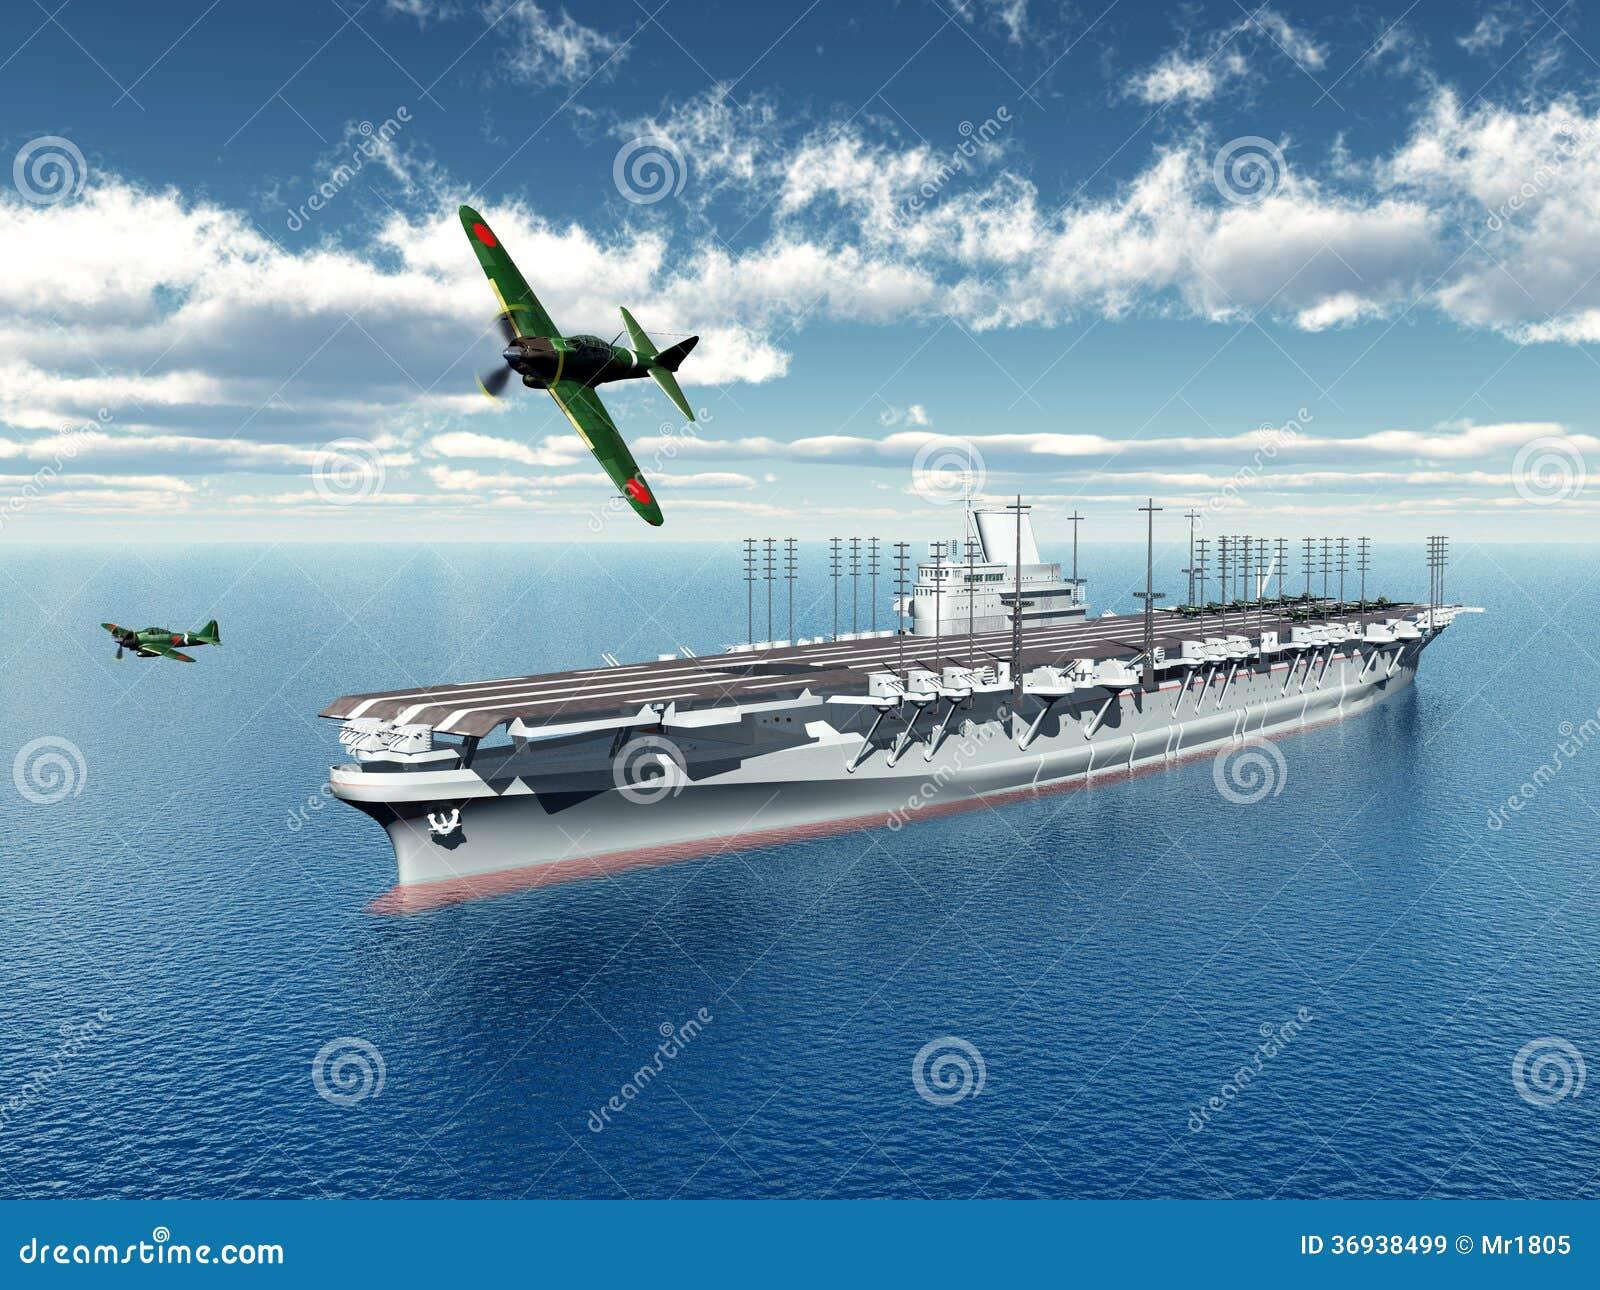 Porte avions japonais illustration stock illustration du - Porte avion japonais seconde guerre mondiale ...